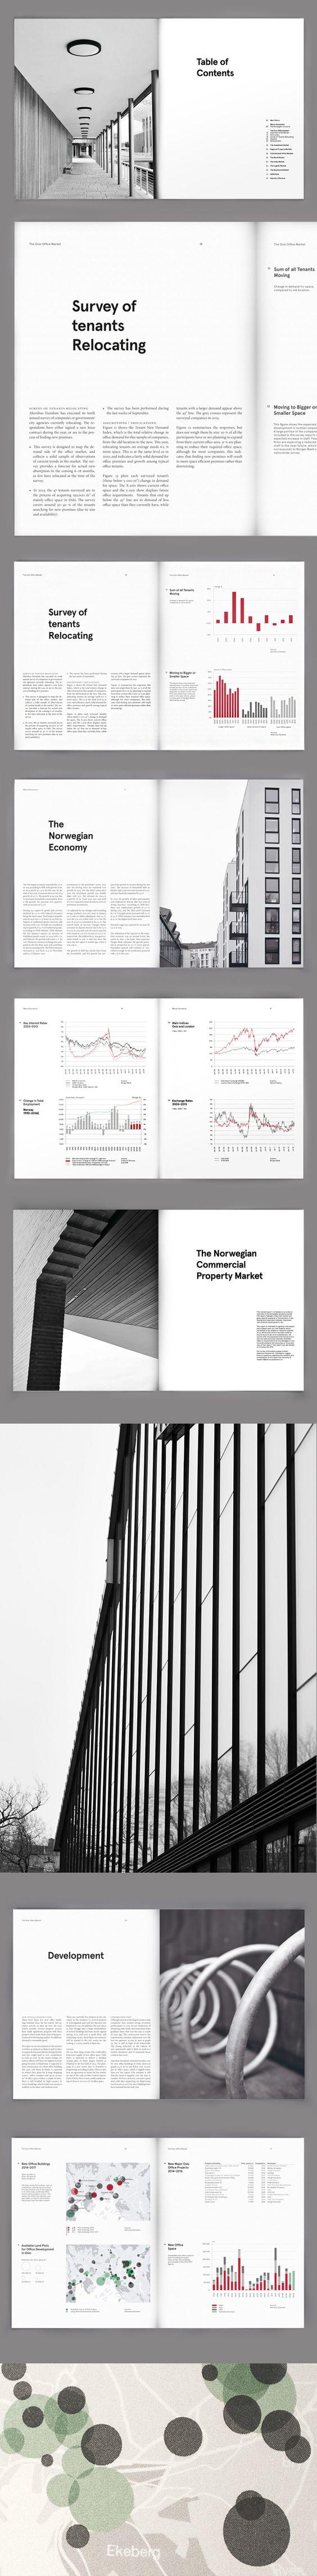 Akershus Eiendom Annual Report Layout Design | Publication and Print Design